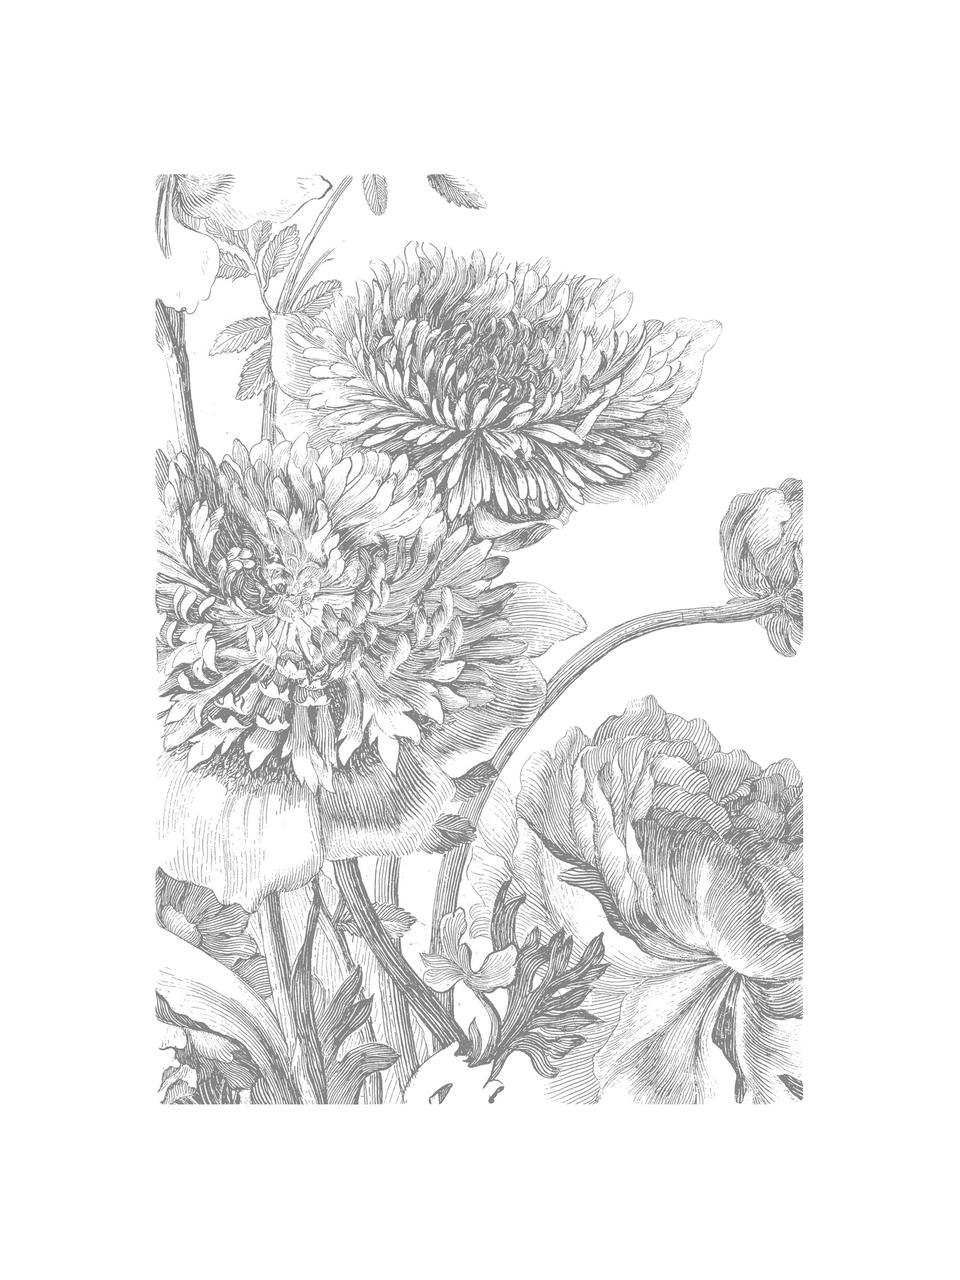 Carta da parati Engraved Flowers, Vello, ecologico e biodegradabile, Grigio, bianco, Larg. 389 x Alt. 280 cm